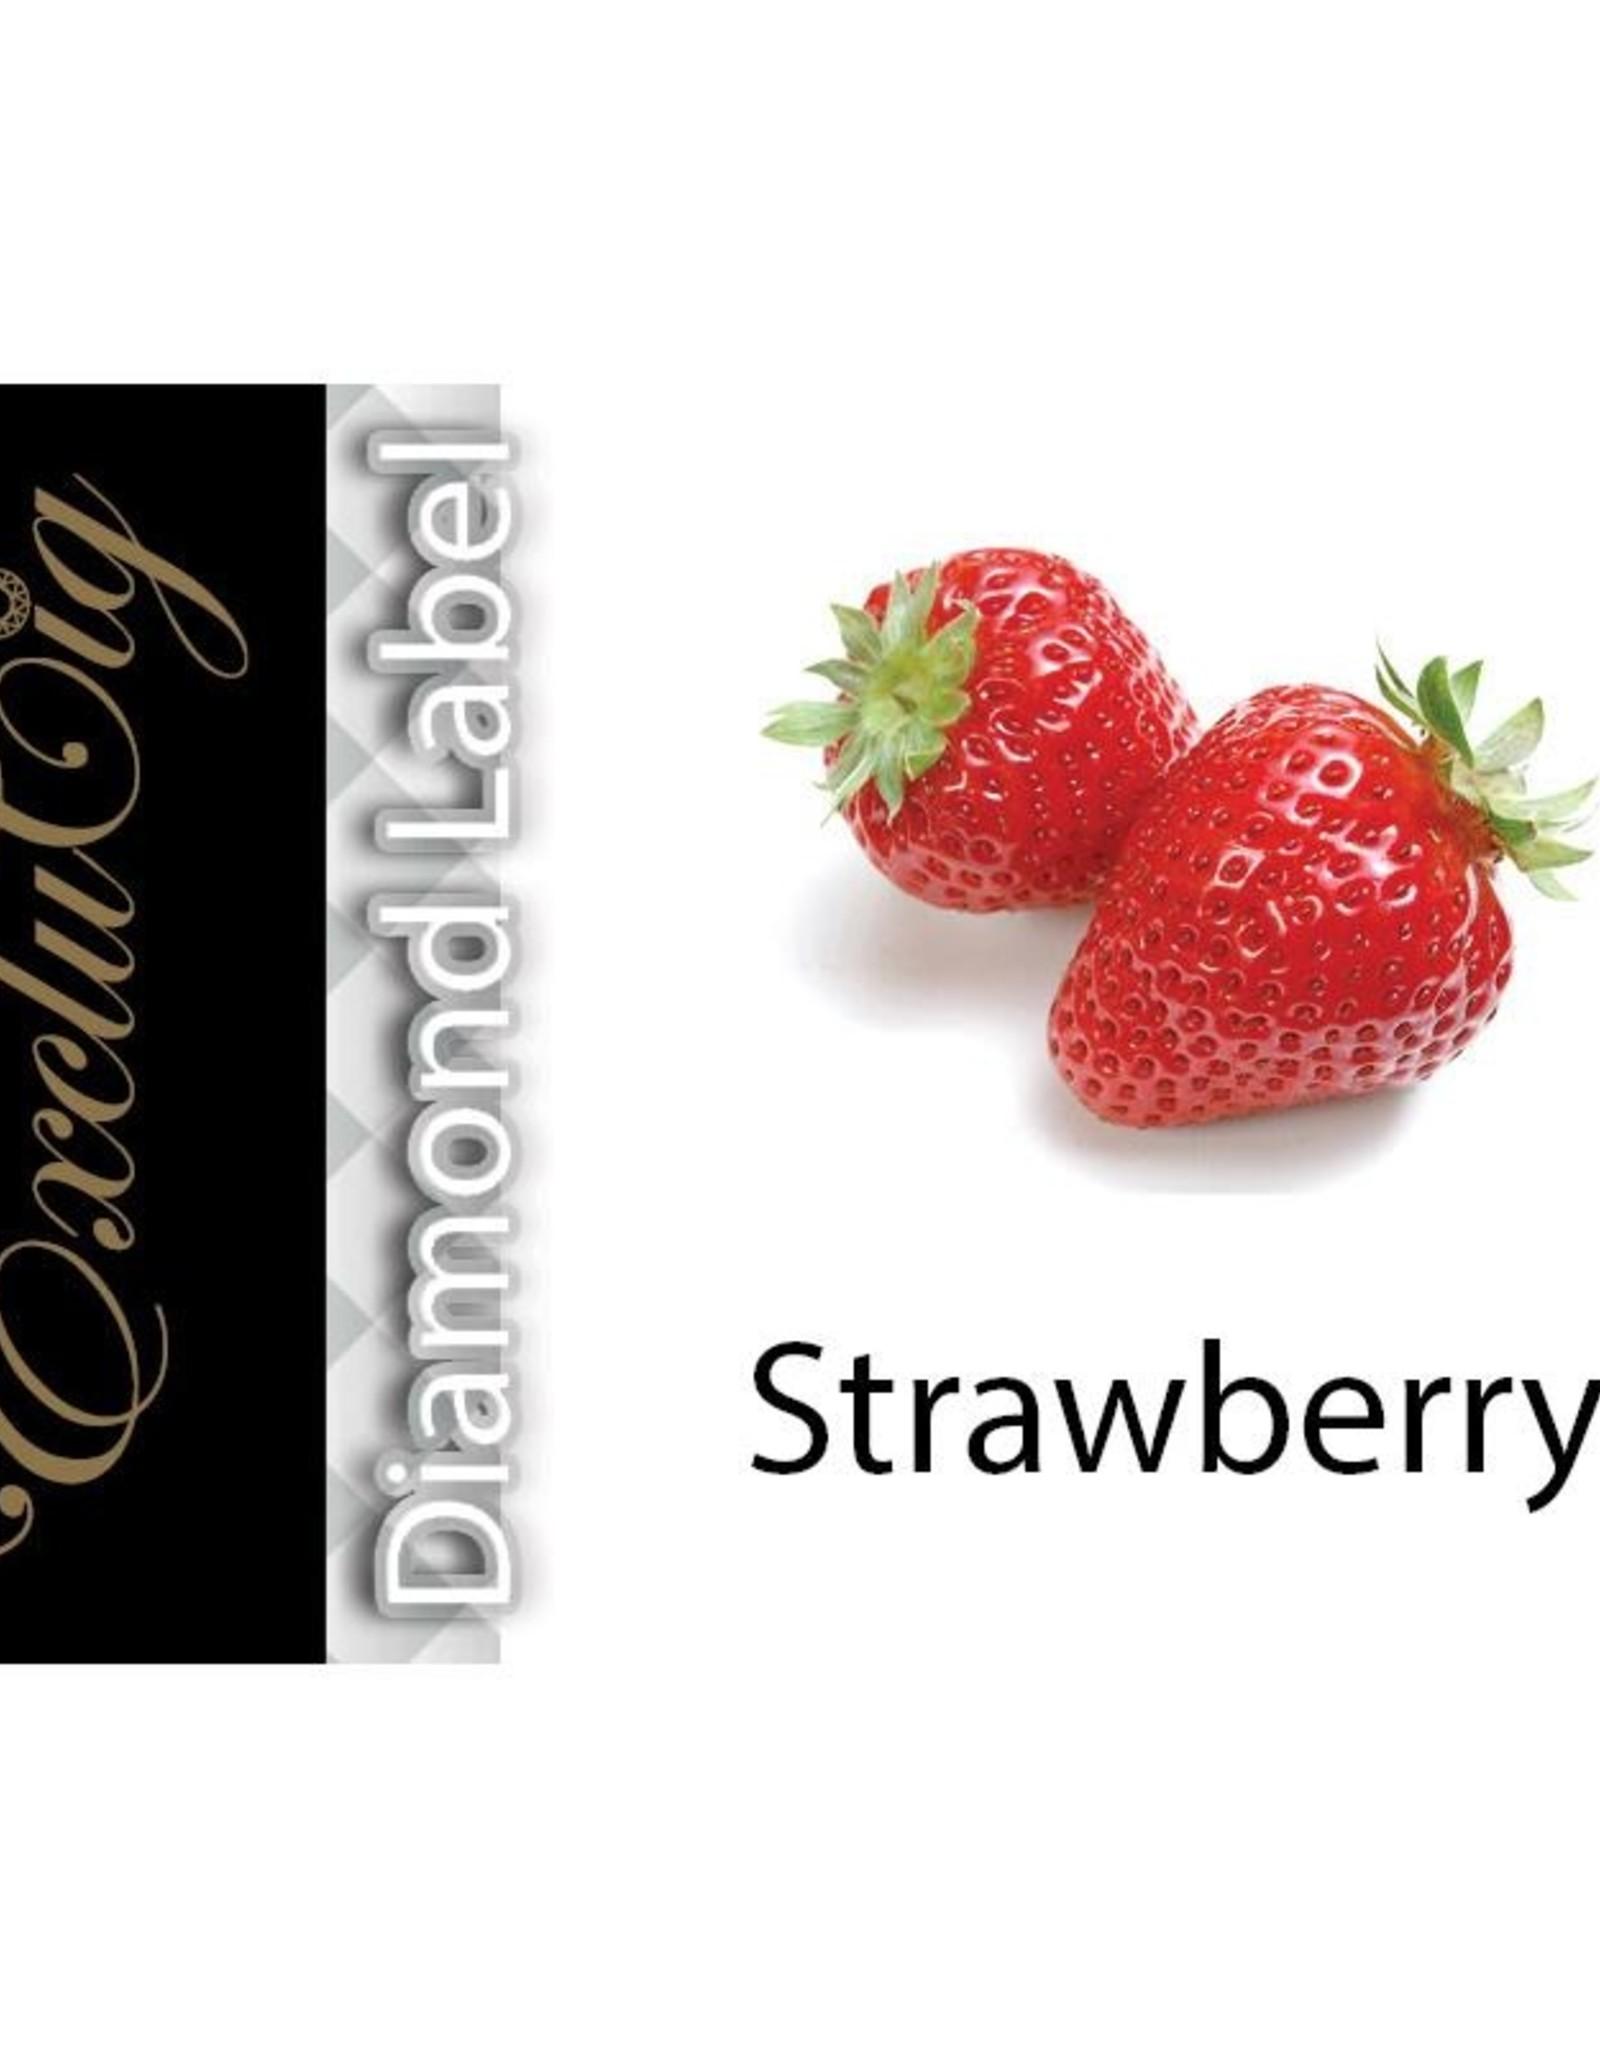 Exclucig Exclucig Diamond Label E-liquid Strawberry 0 mg Nicotine